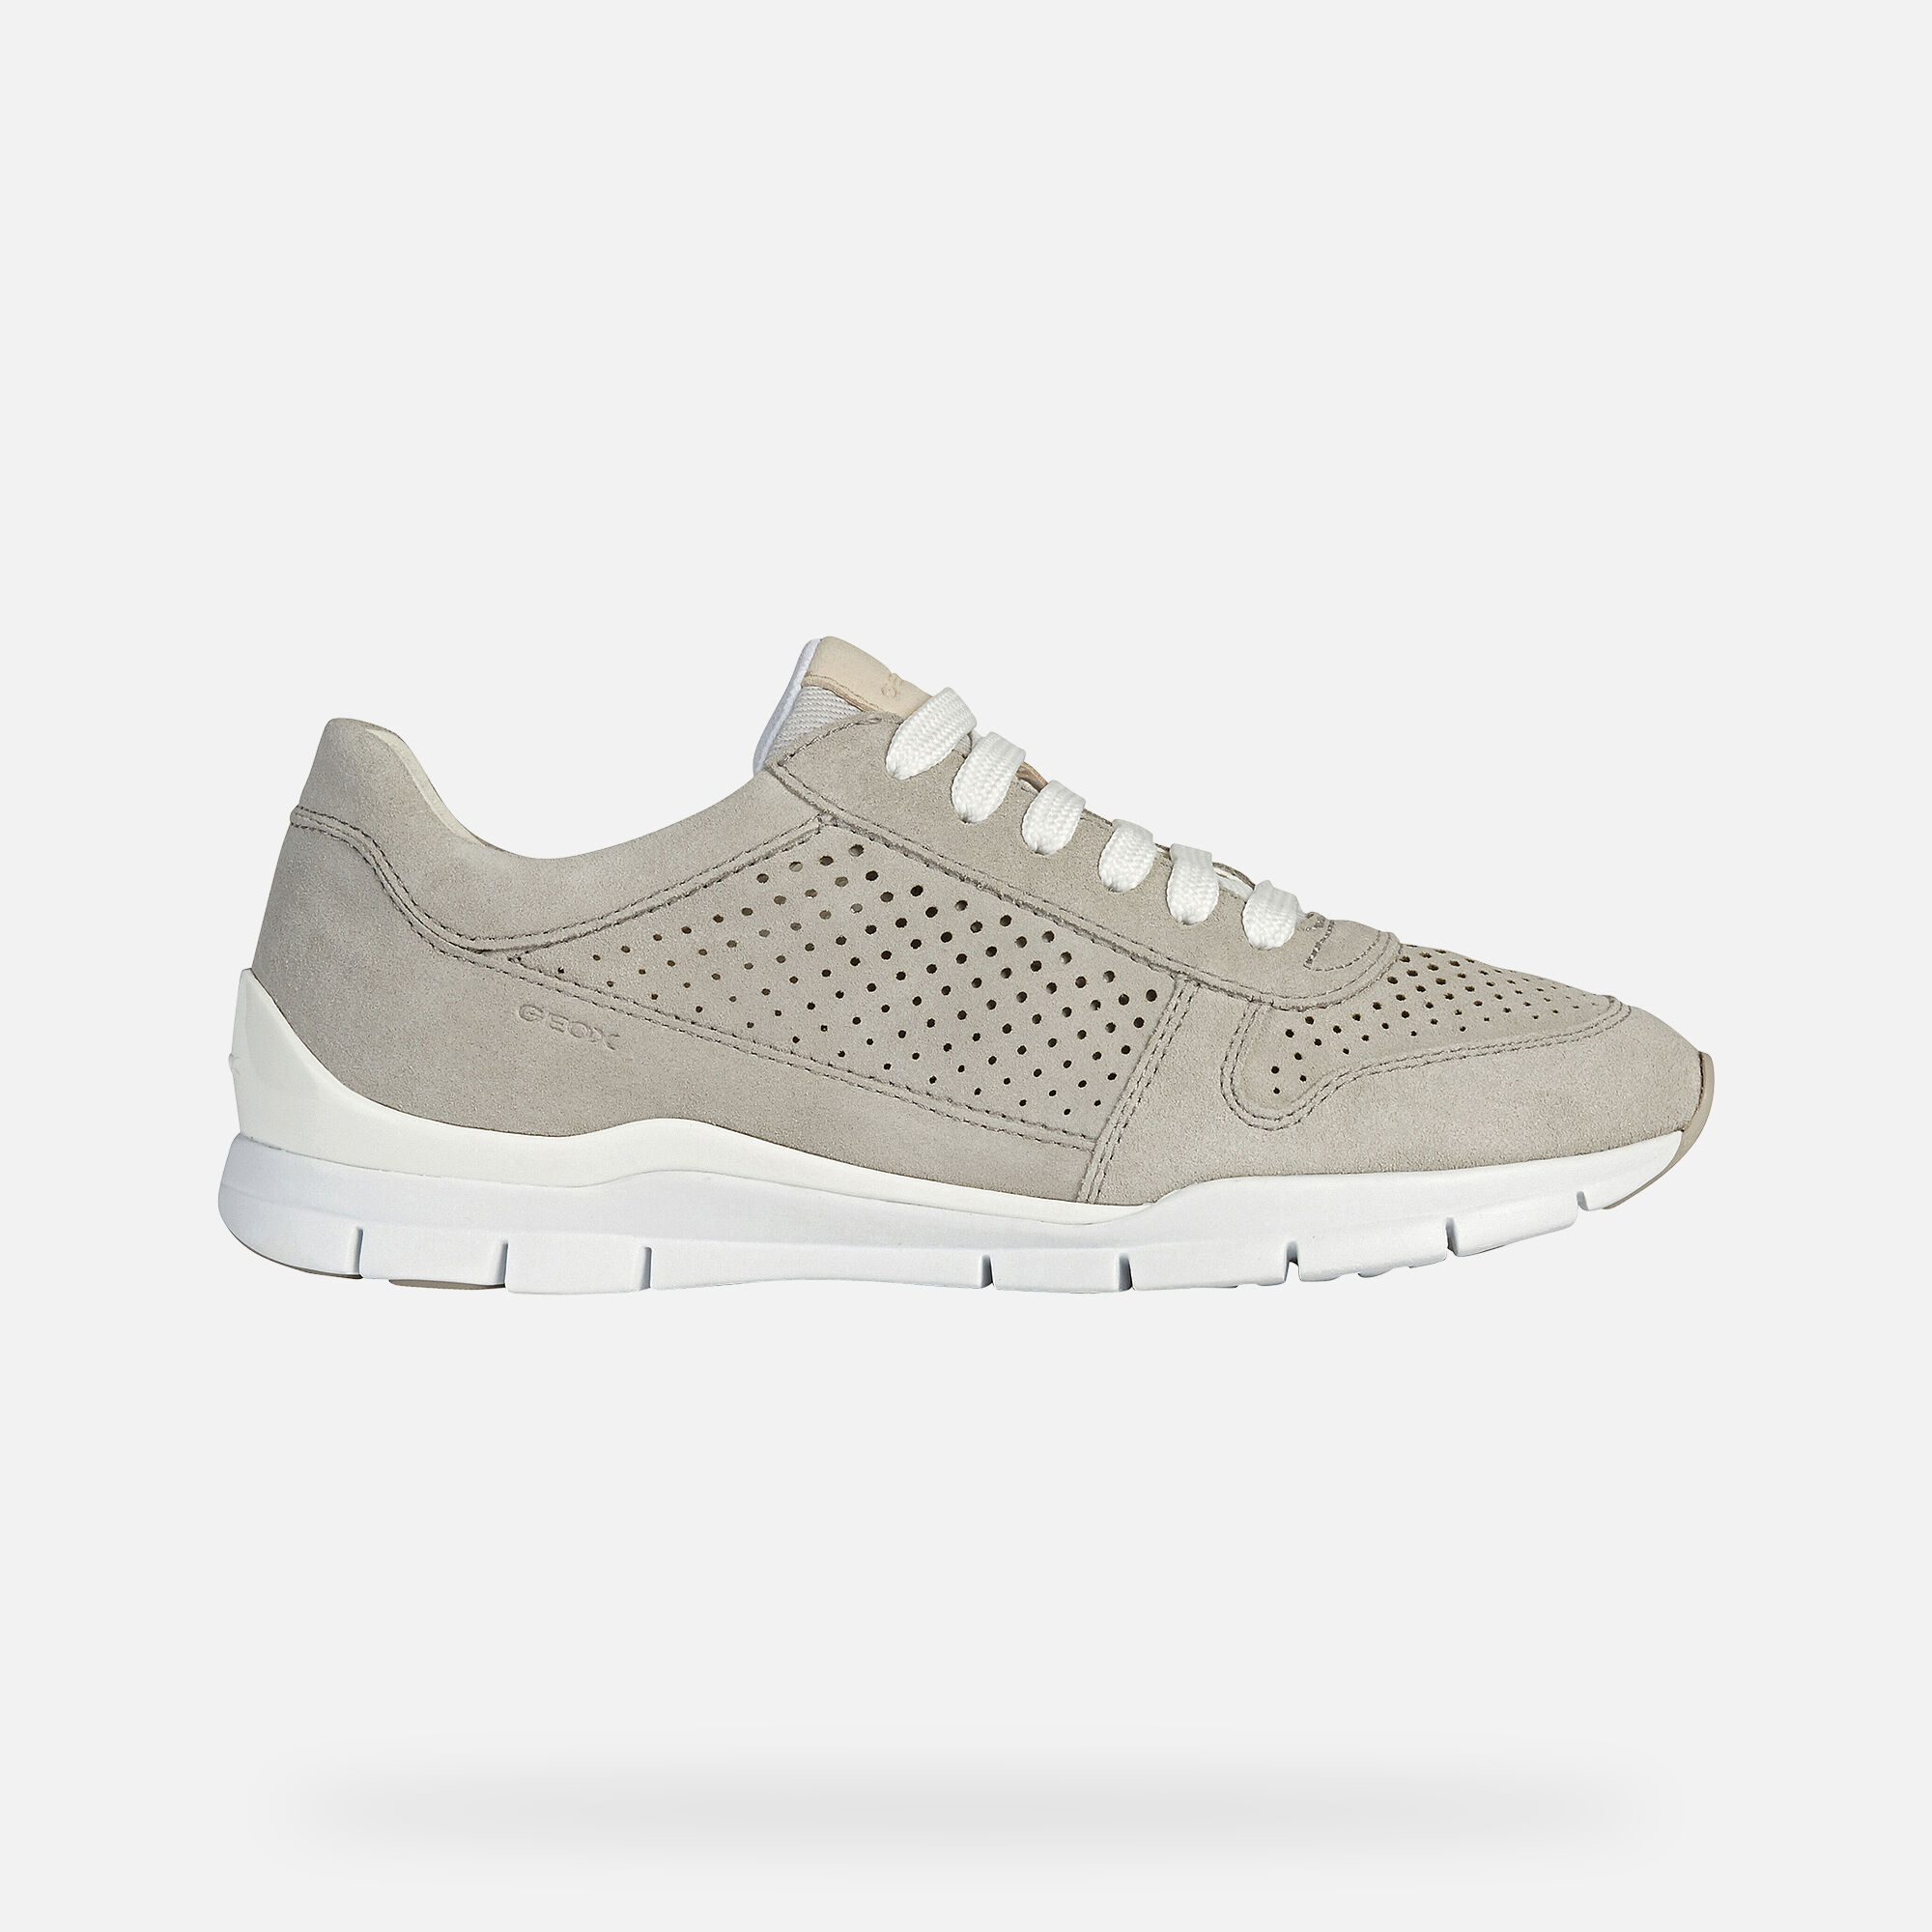 Geox SUKIE Woman: Grey Sneakers   Geox